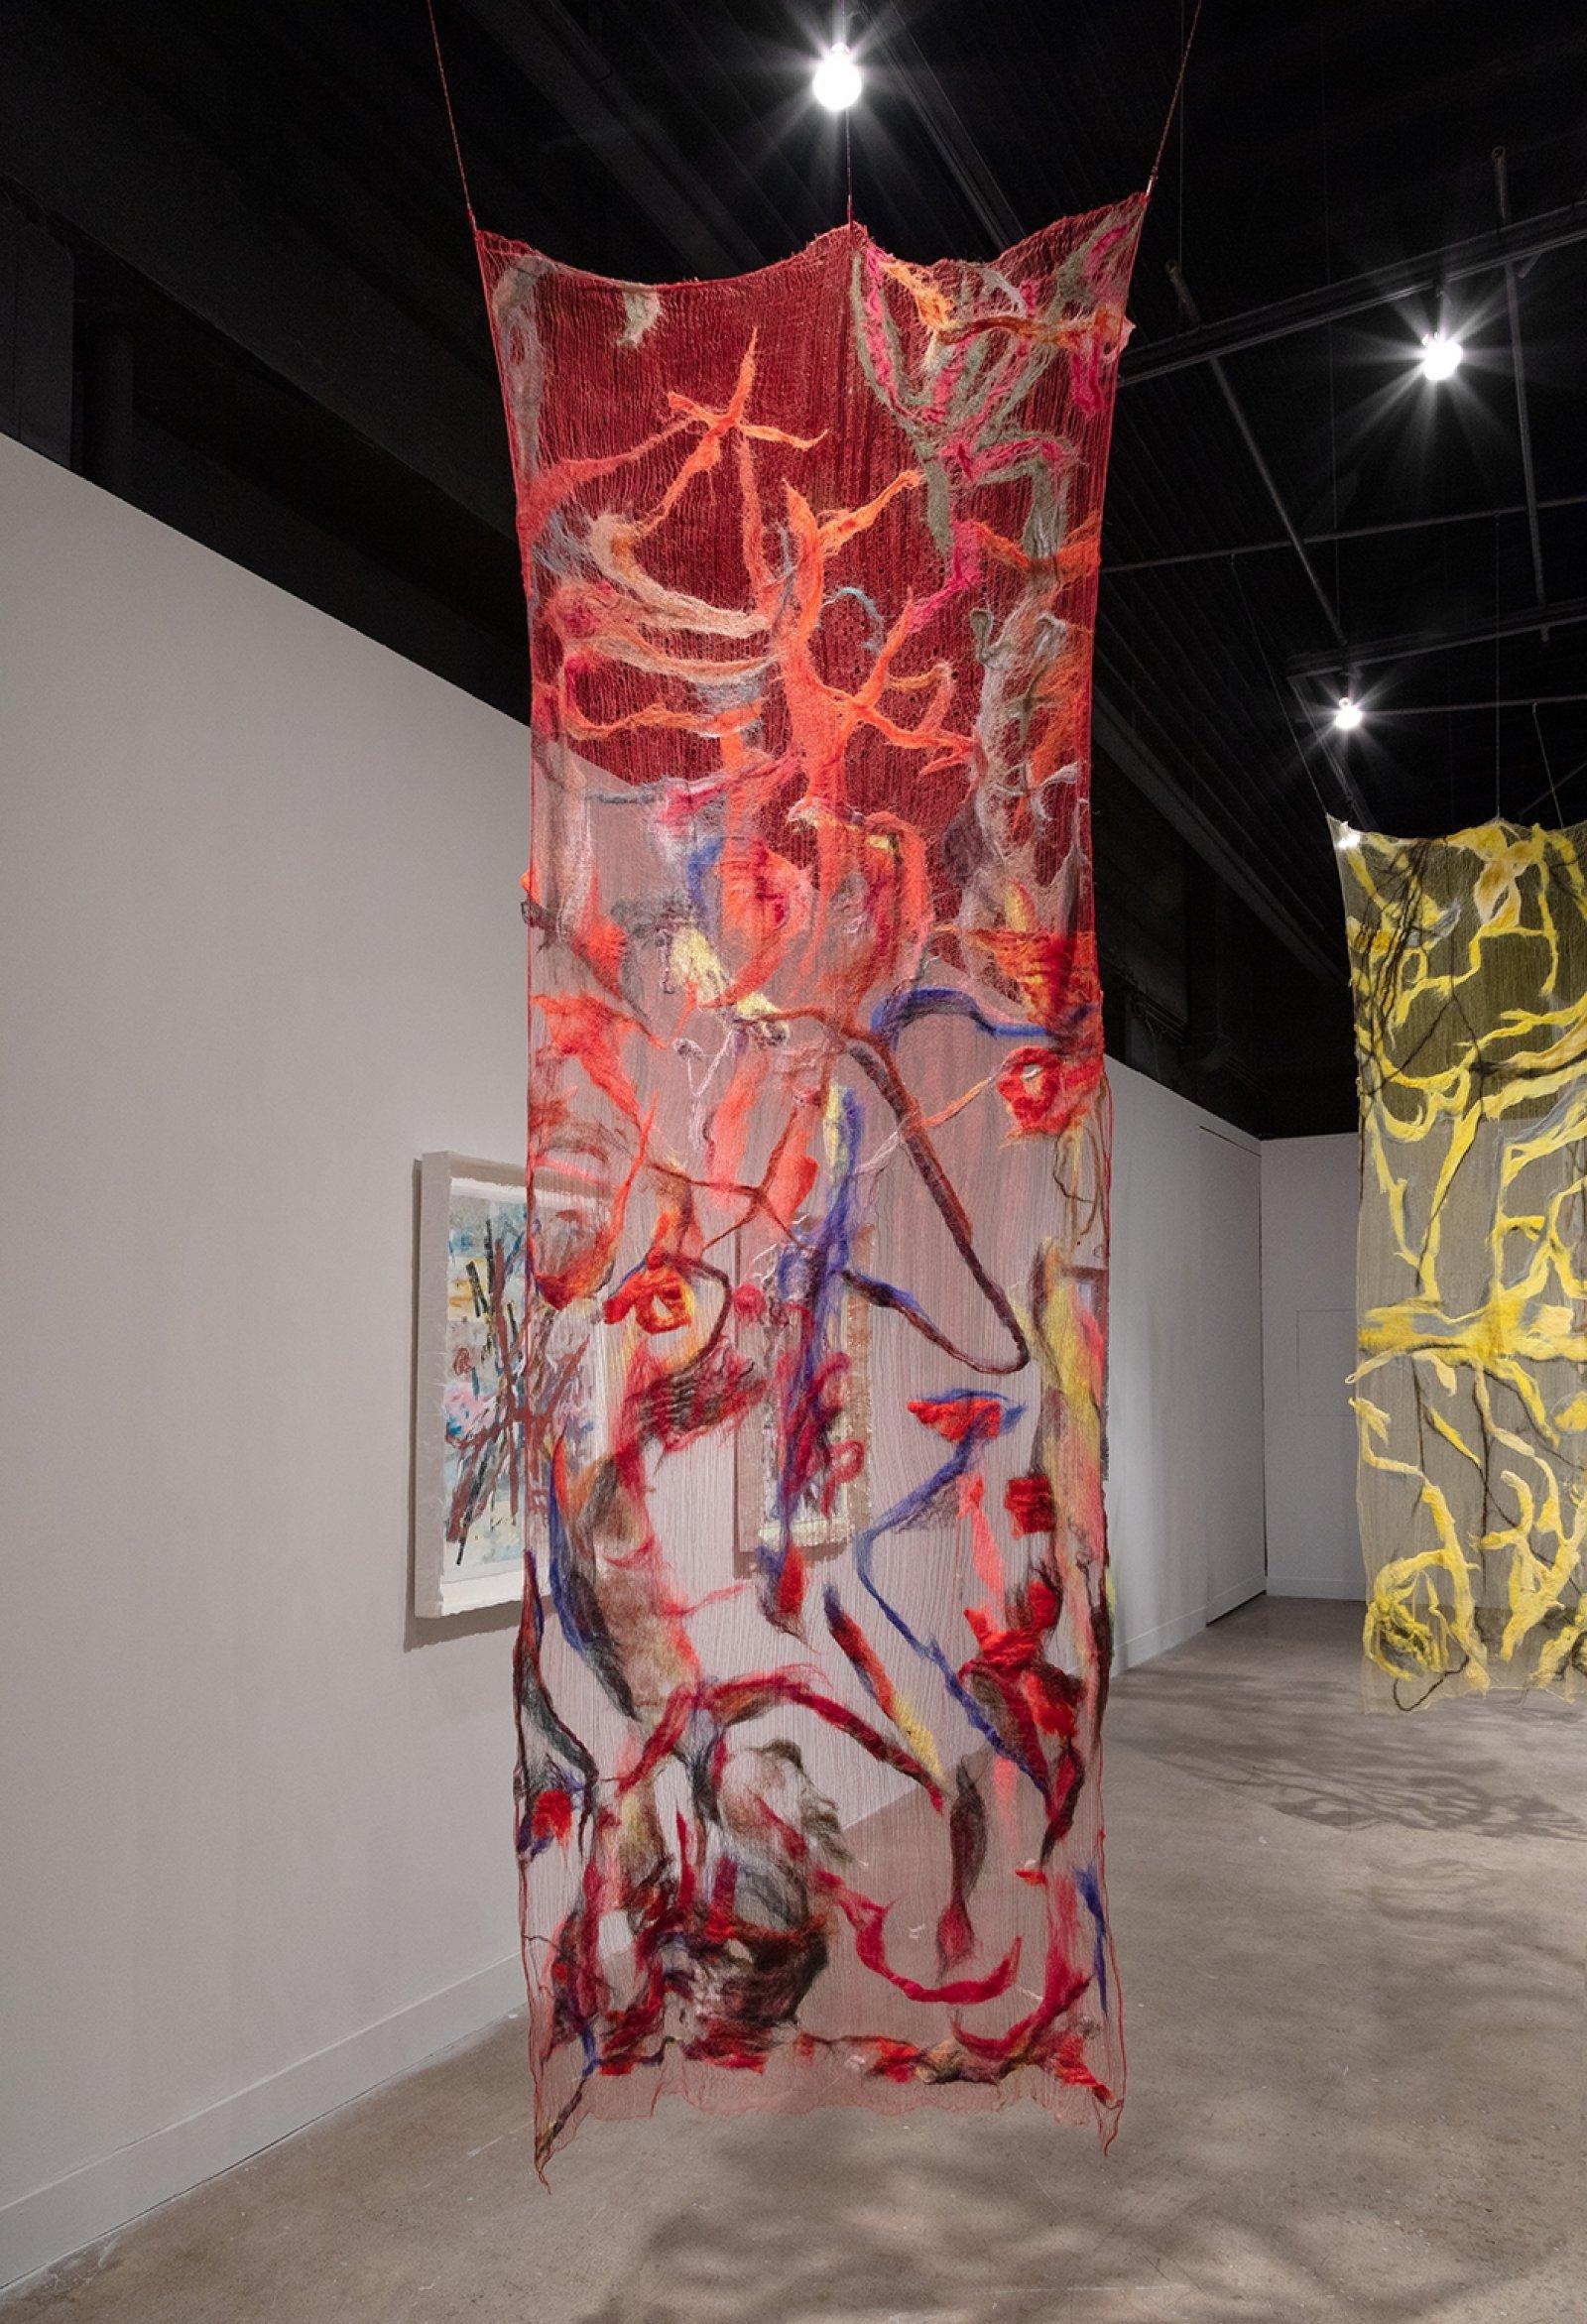 Rebecca Brewer, Scrim: Tweaker, 2019, silk, wool, ball chain, alligator clips, hooks, 103 x 39 in. (262 x 99 cm). Installation view, Waves and Waves, Oakville Galleries, Oakville, 2019